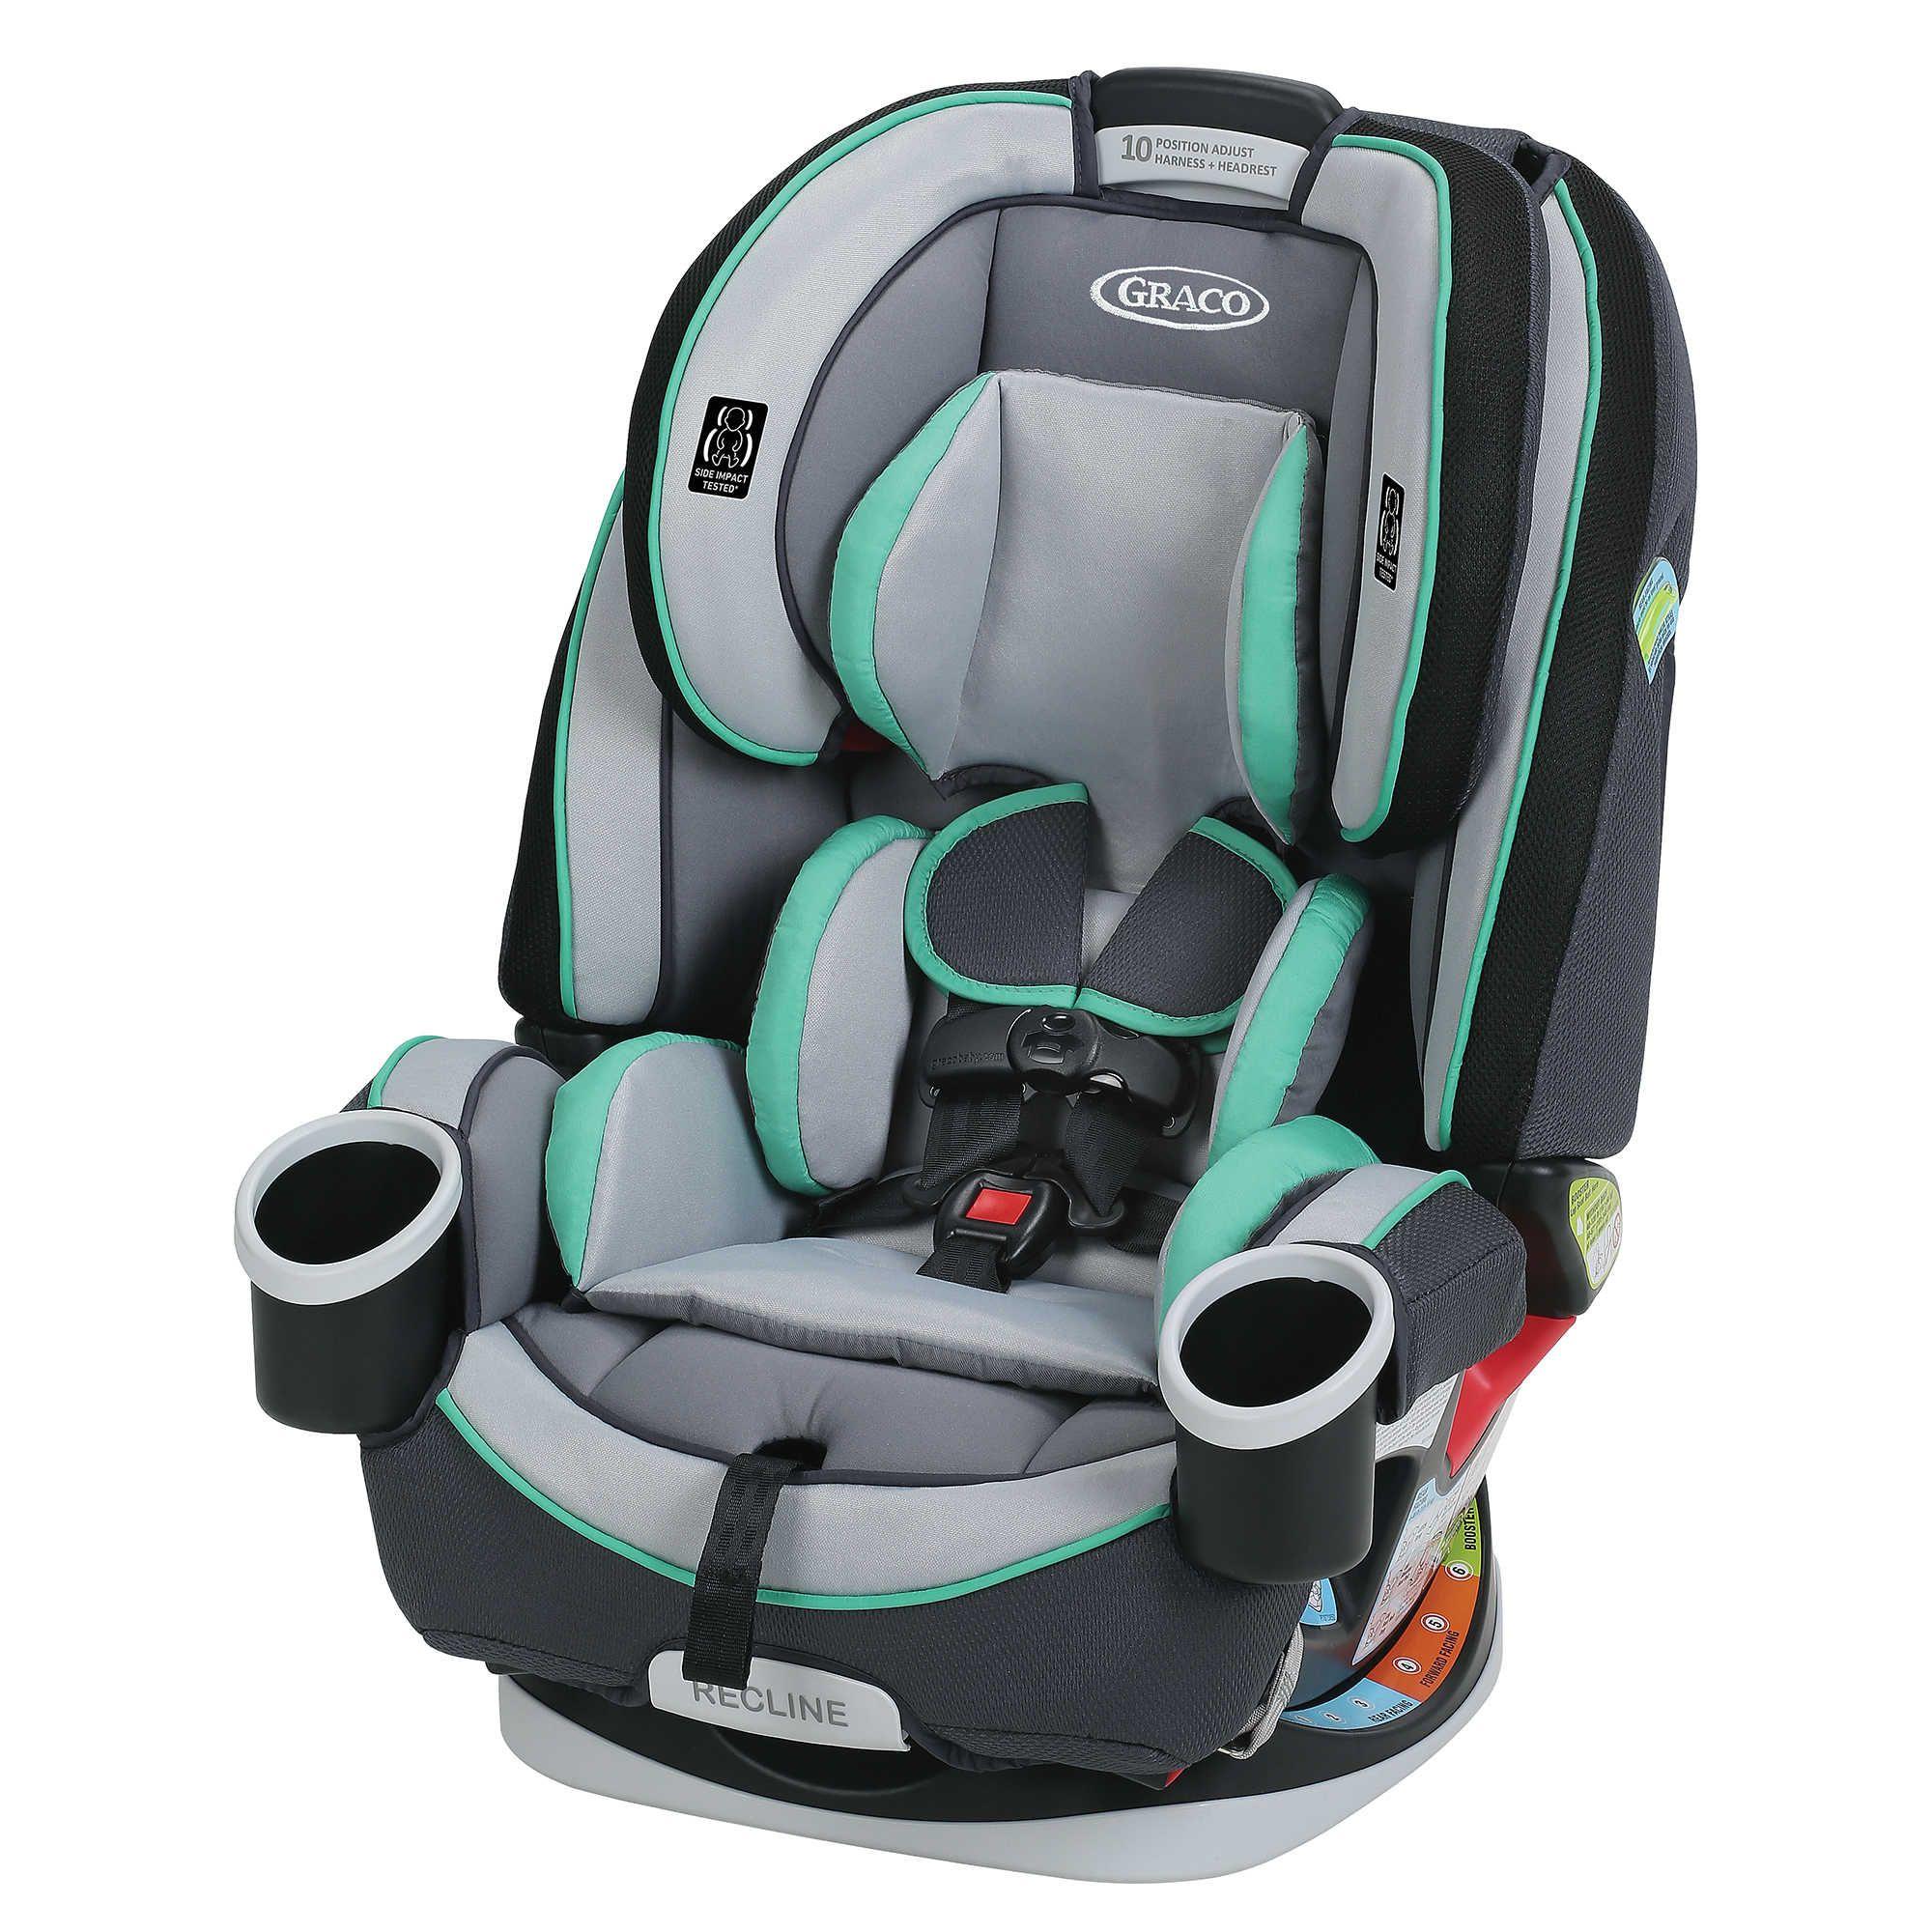 Graco® 4Ever™ Allin1 Convertible Car Seat in Basin